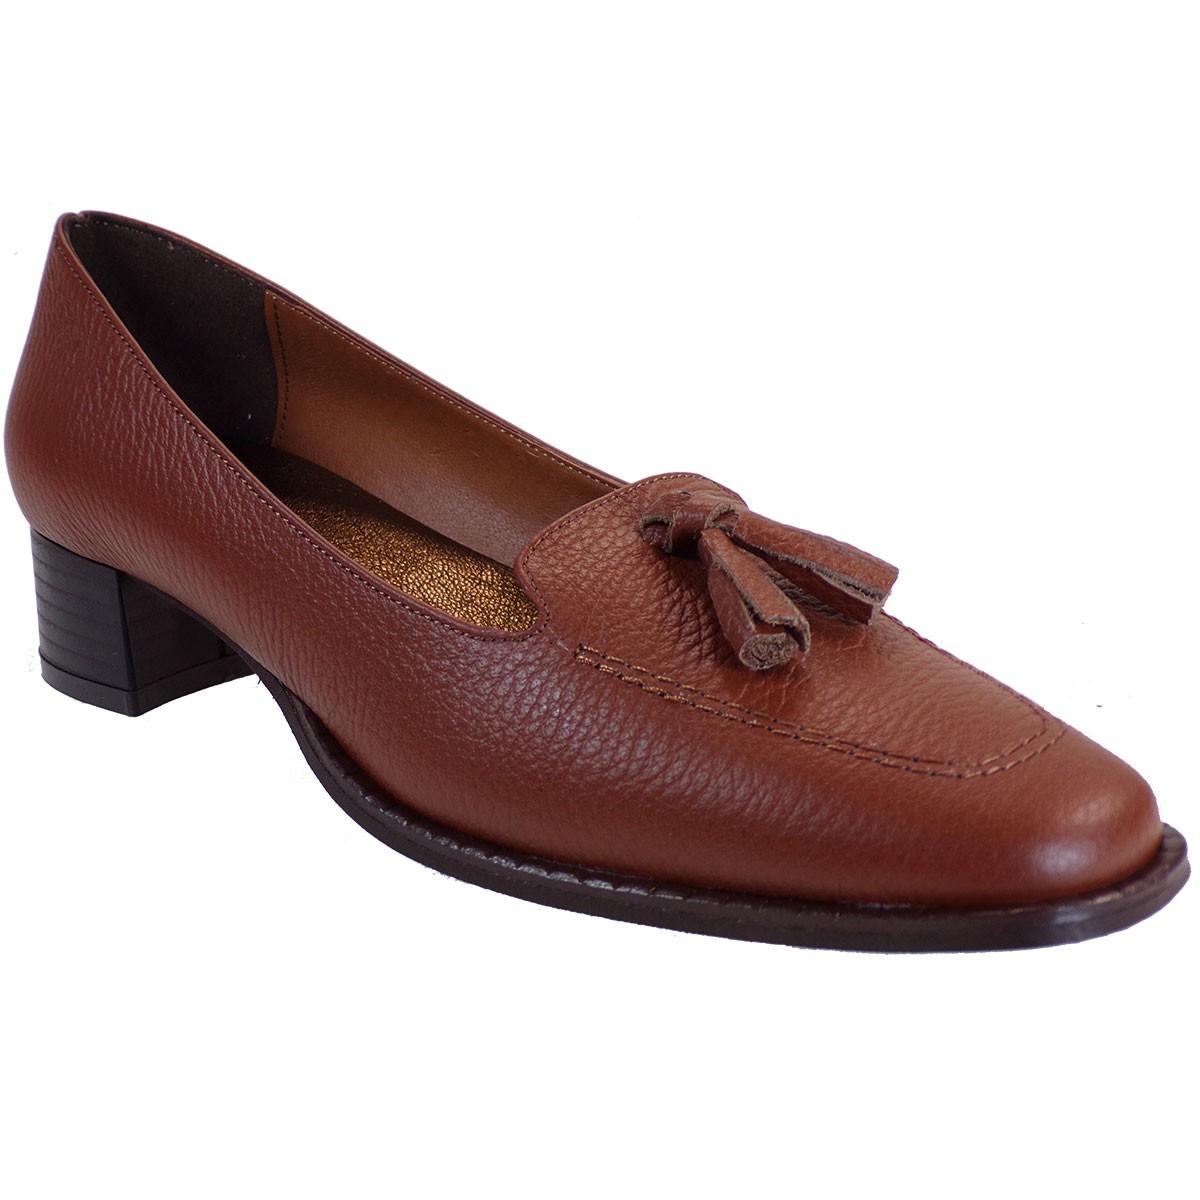 Katia Shoes Γυναικεία Παπούτσια Γόβες Κ32-5037 Ταμπά Δέρμα